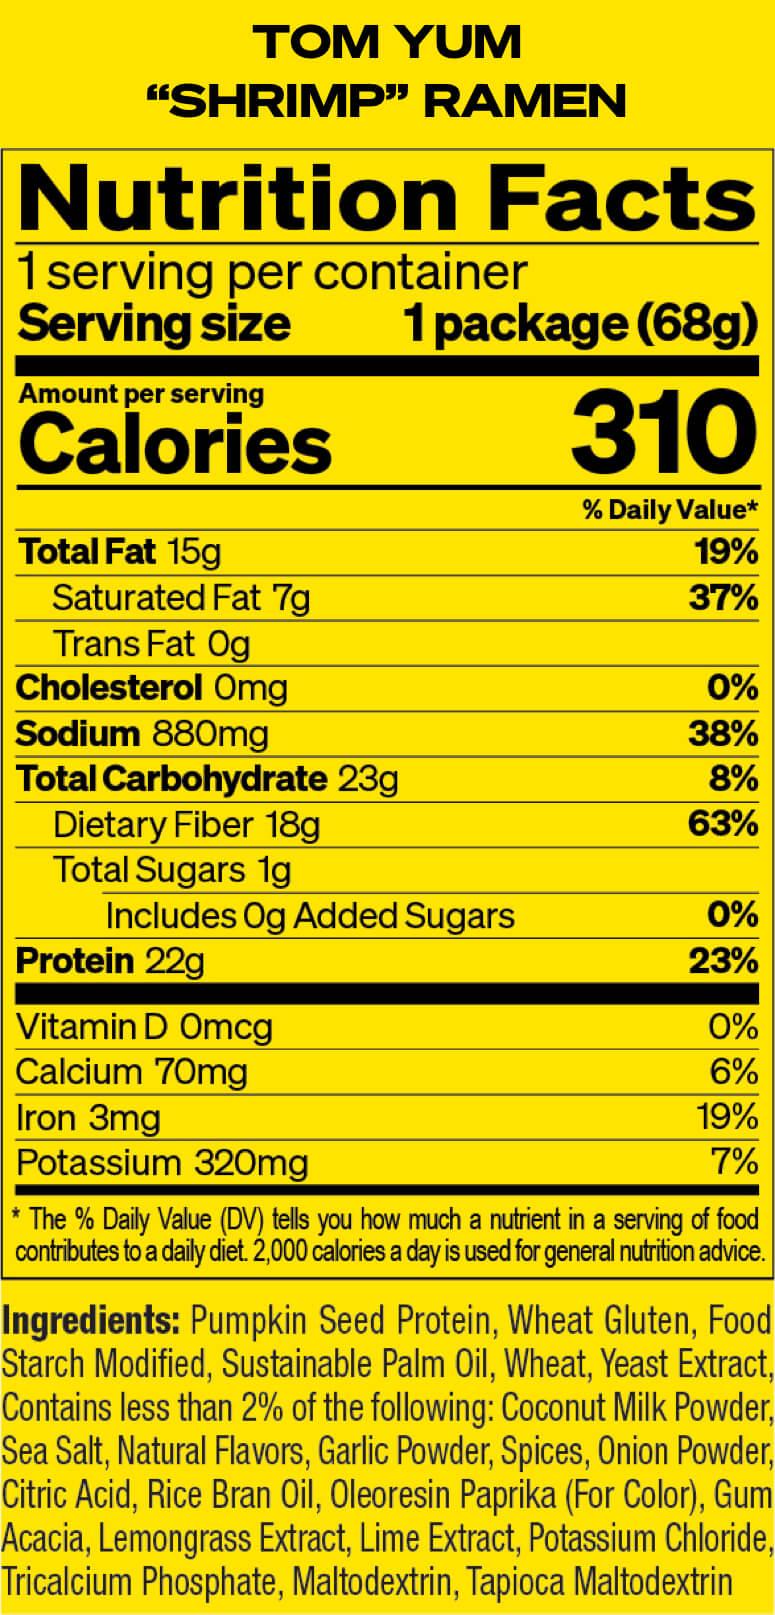 Tom Yum Shrimp Nutrition Facts